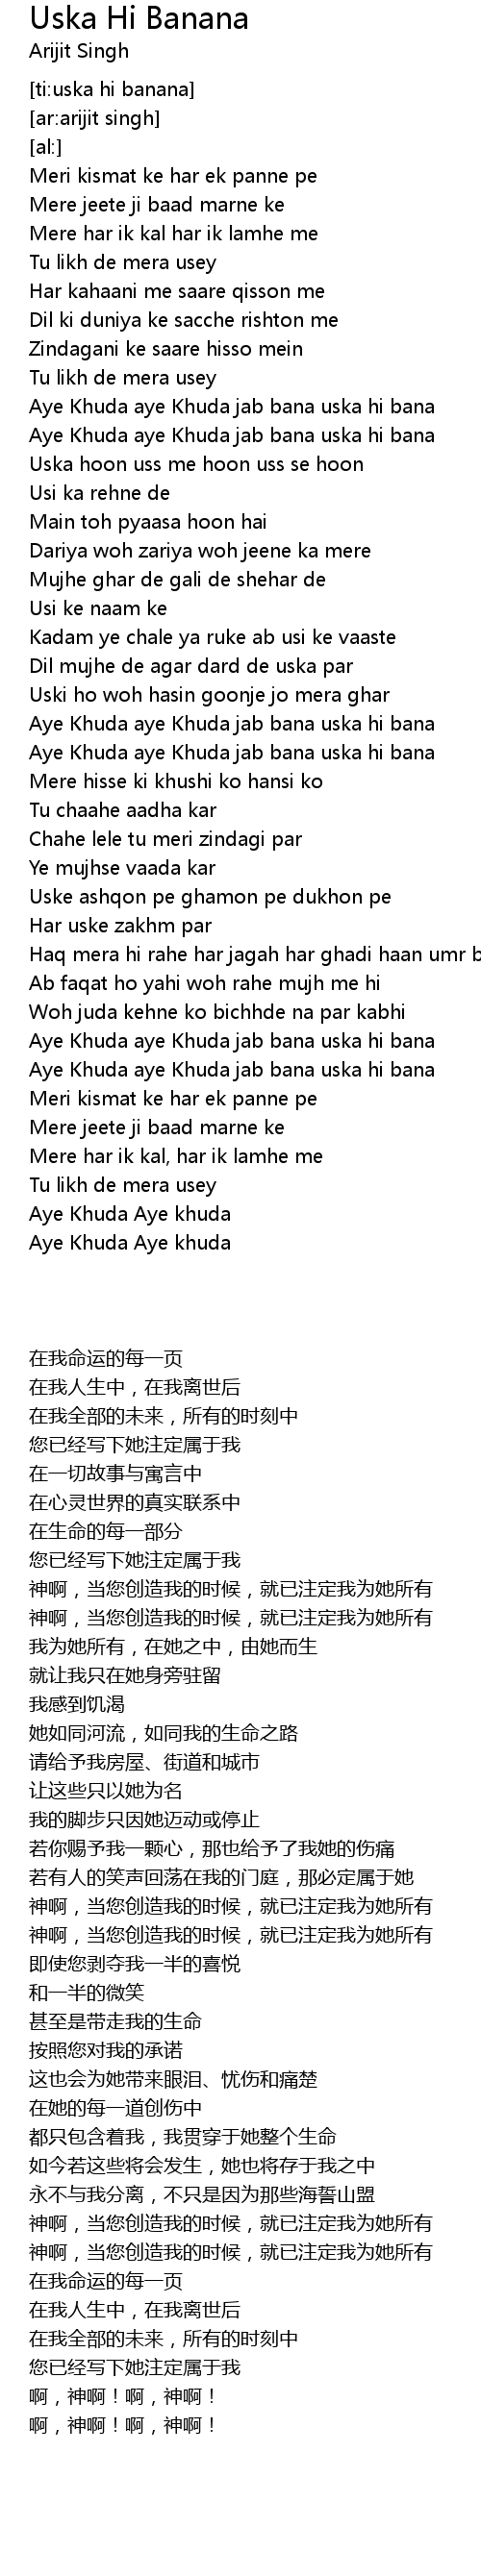 Uska Hi Banana Lyrics Follow Lyrics